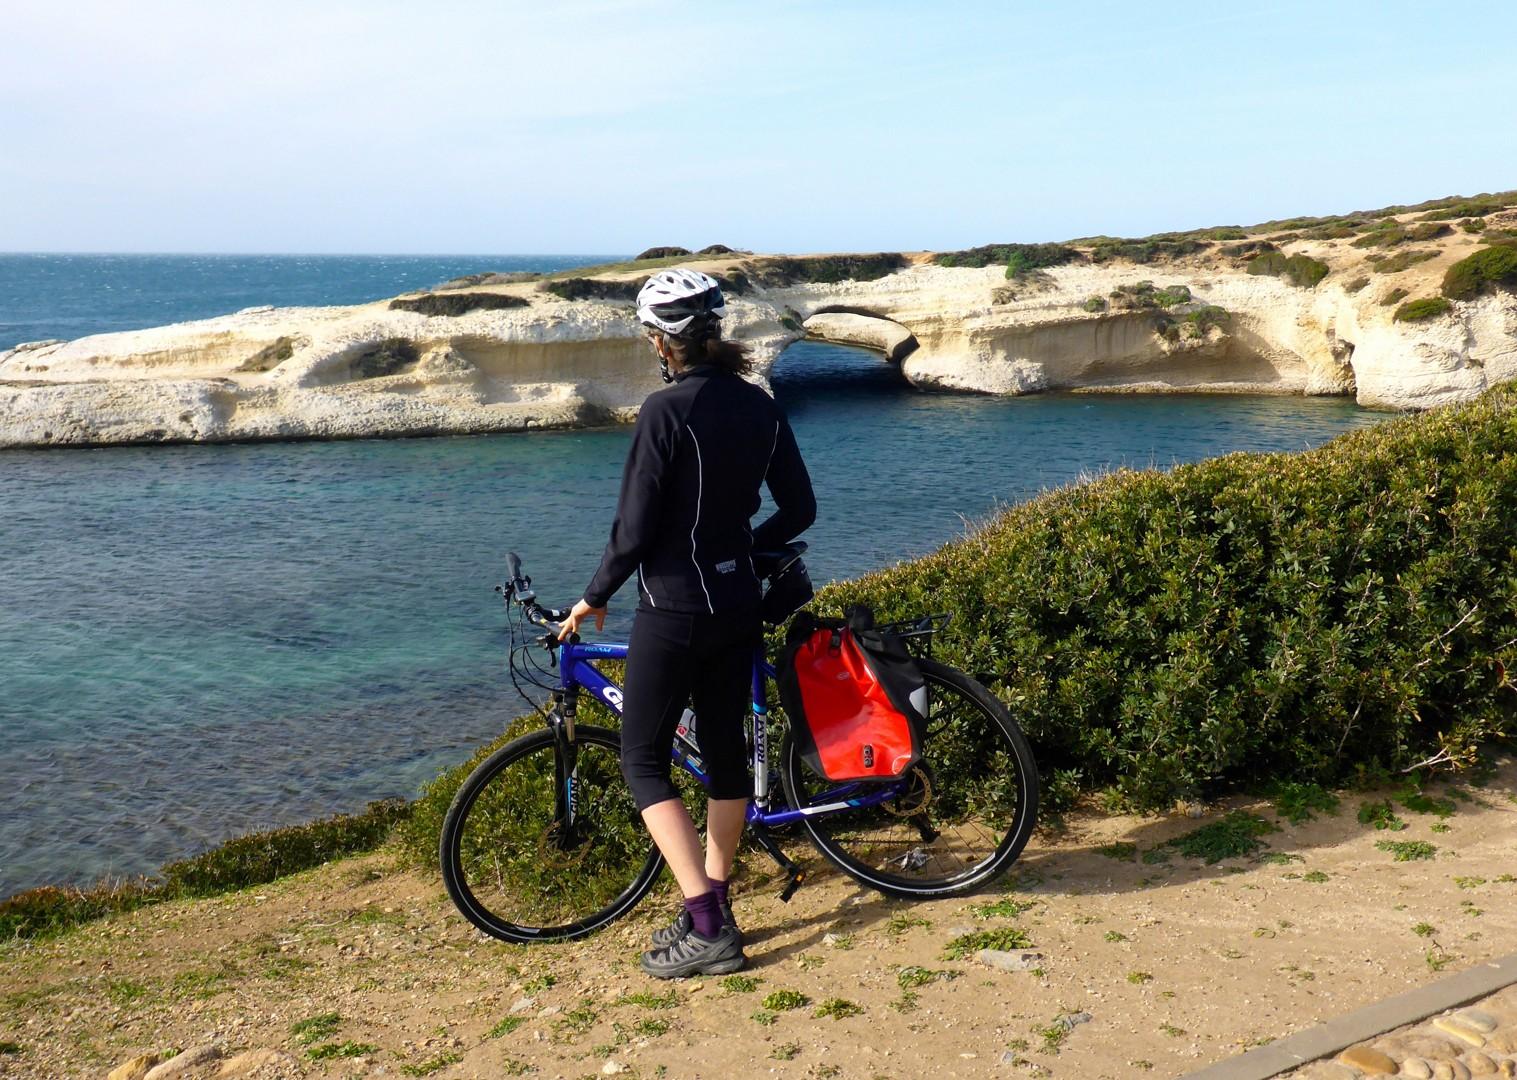 self-guided-leisure-cycling-holiday-gentle-island-cycling-sardinia.jpg - Italy - Sardinia - West Coast Wonders - Leisure Cycling